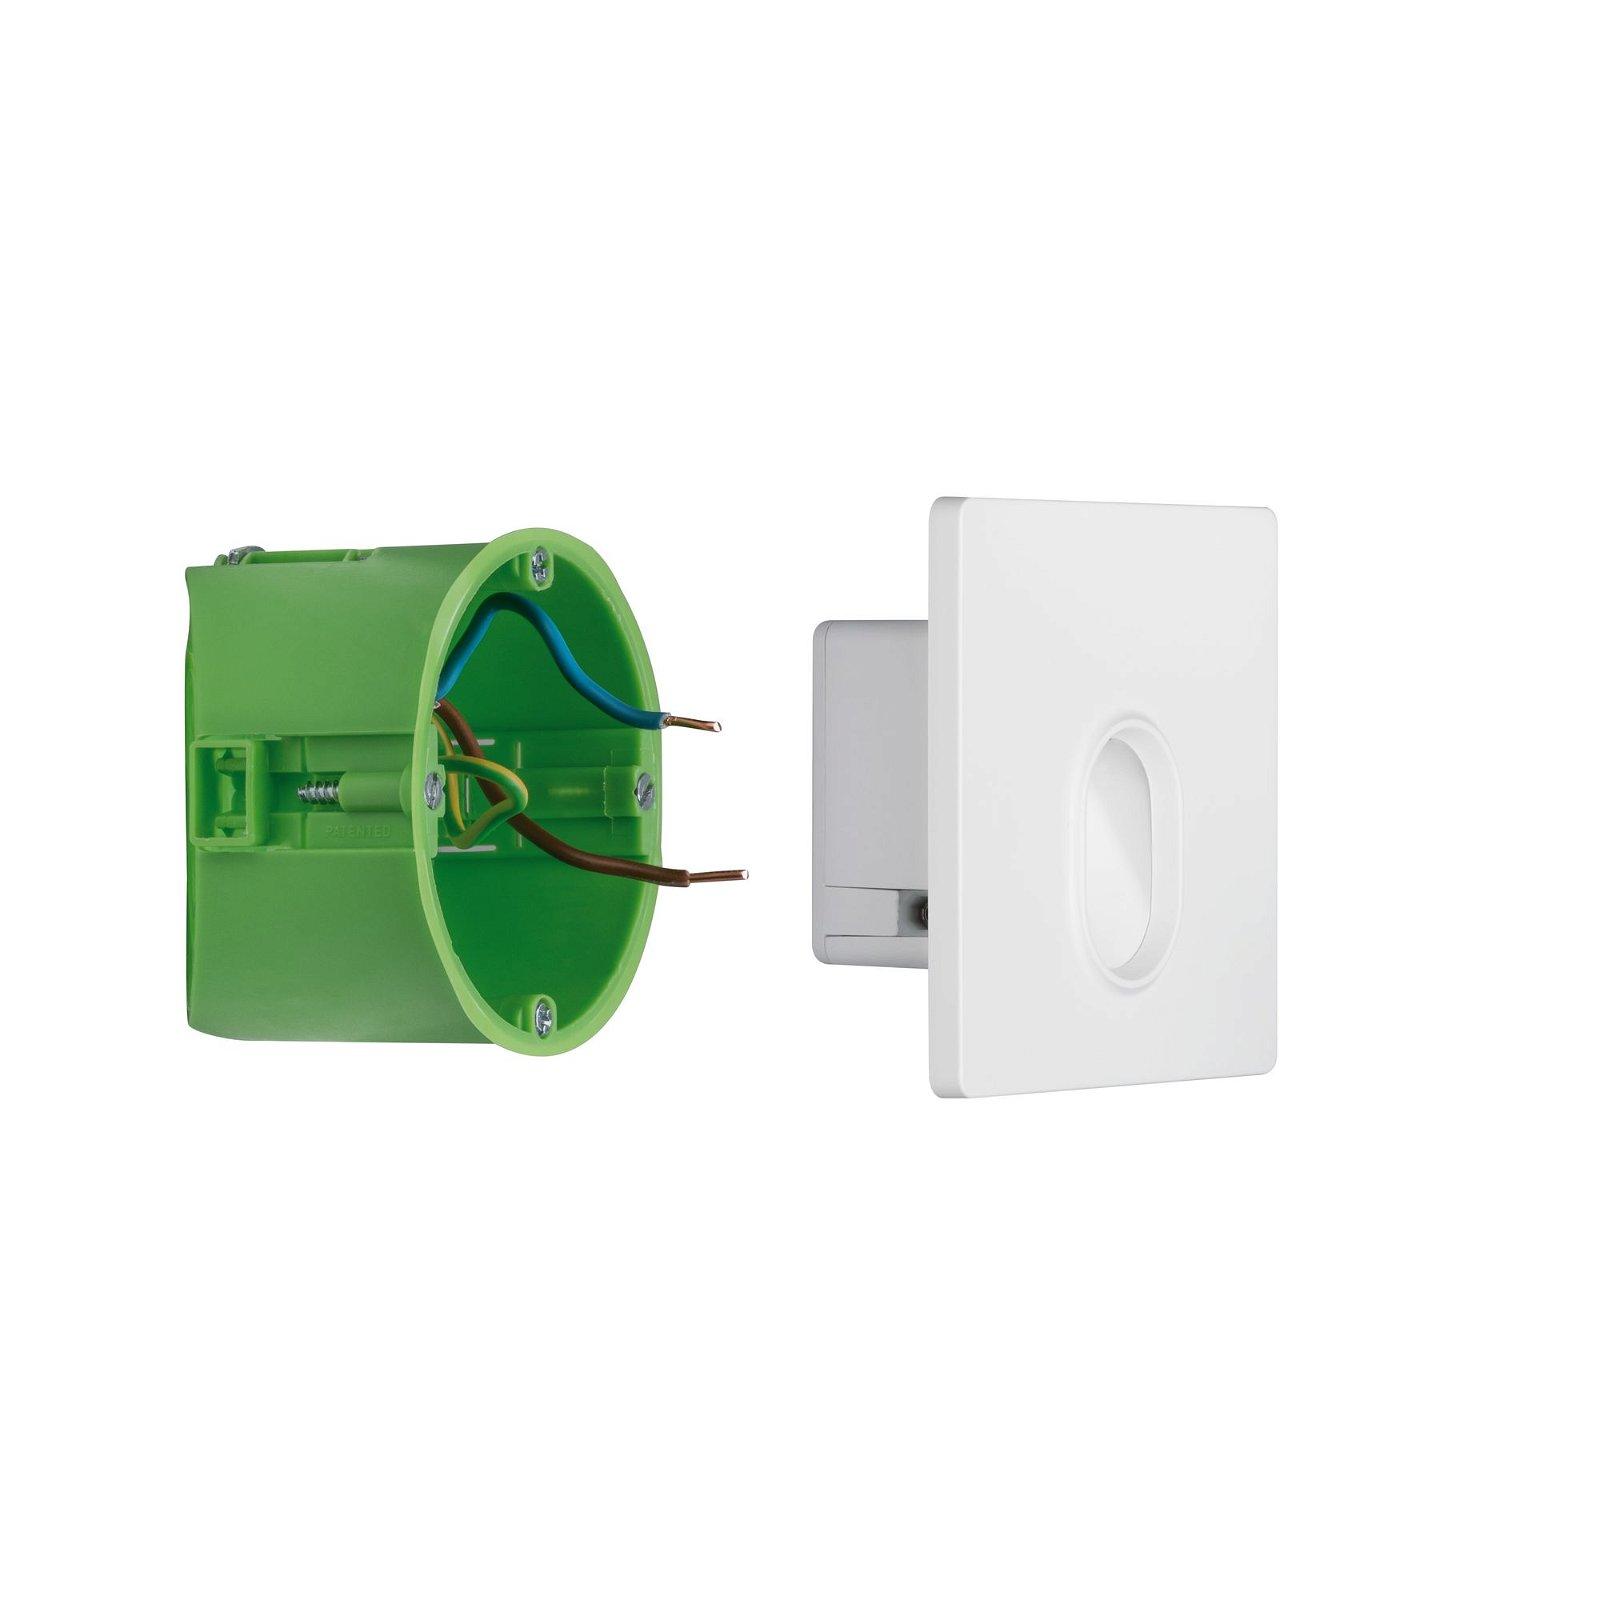 LED Wandeinbauleuchte Wall eckig 78mm 1,7W 110lm 230V 2700K Weiß